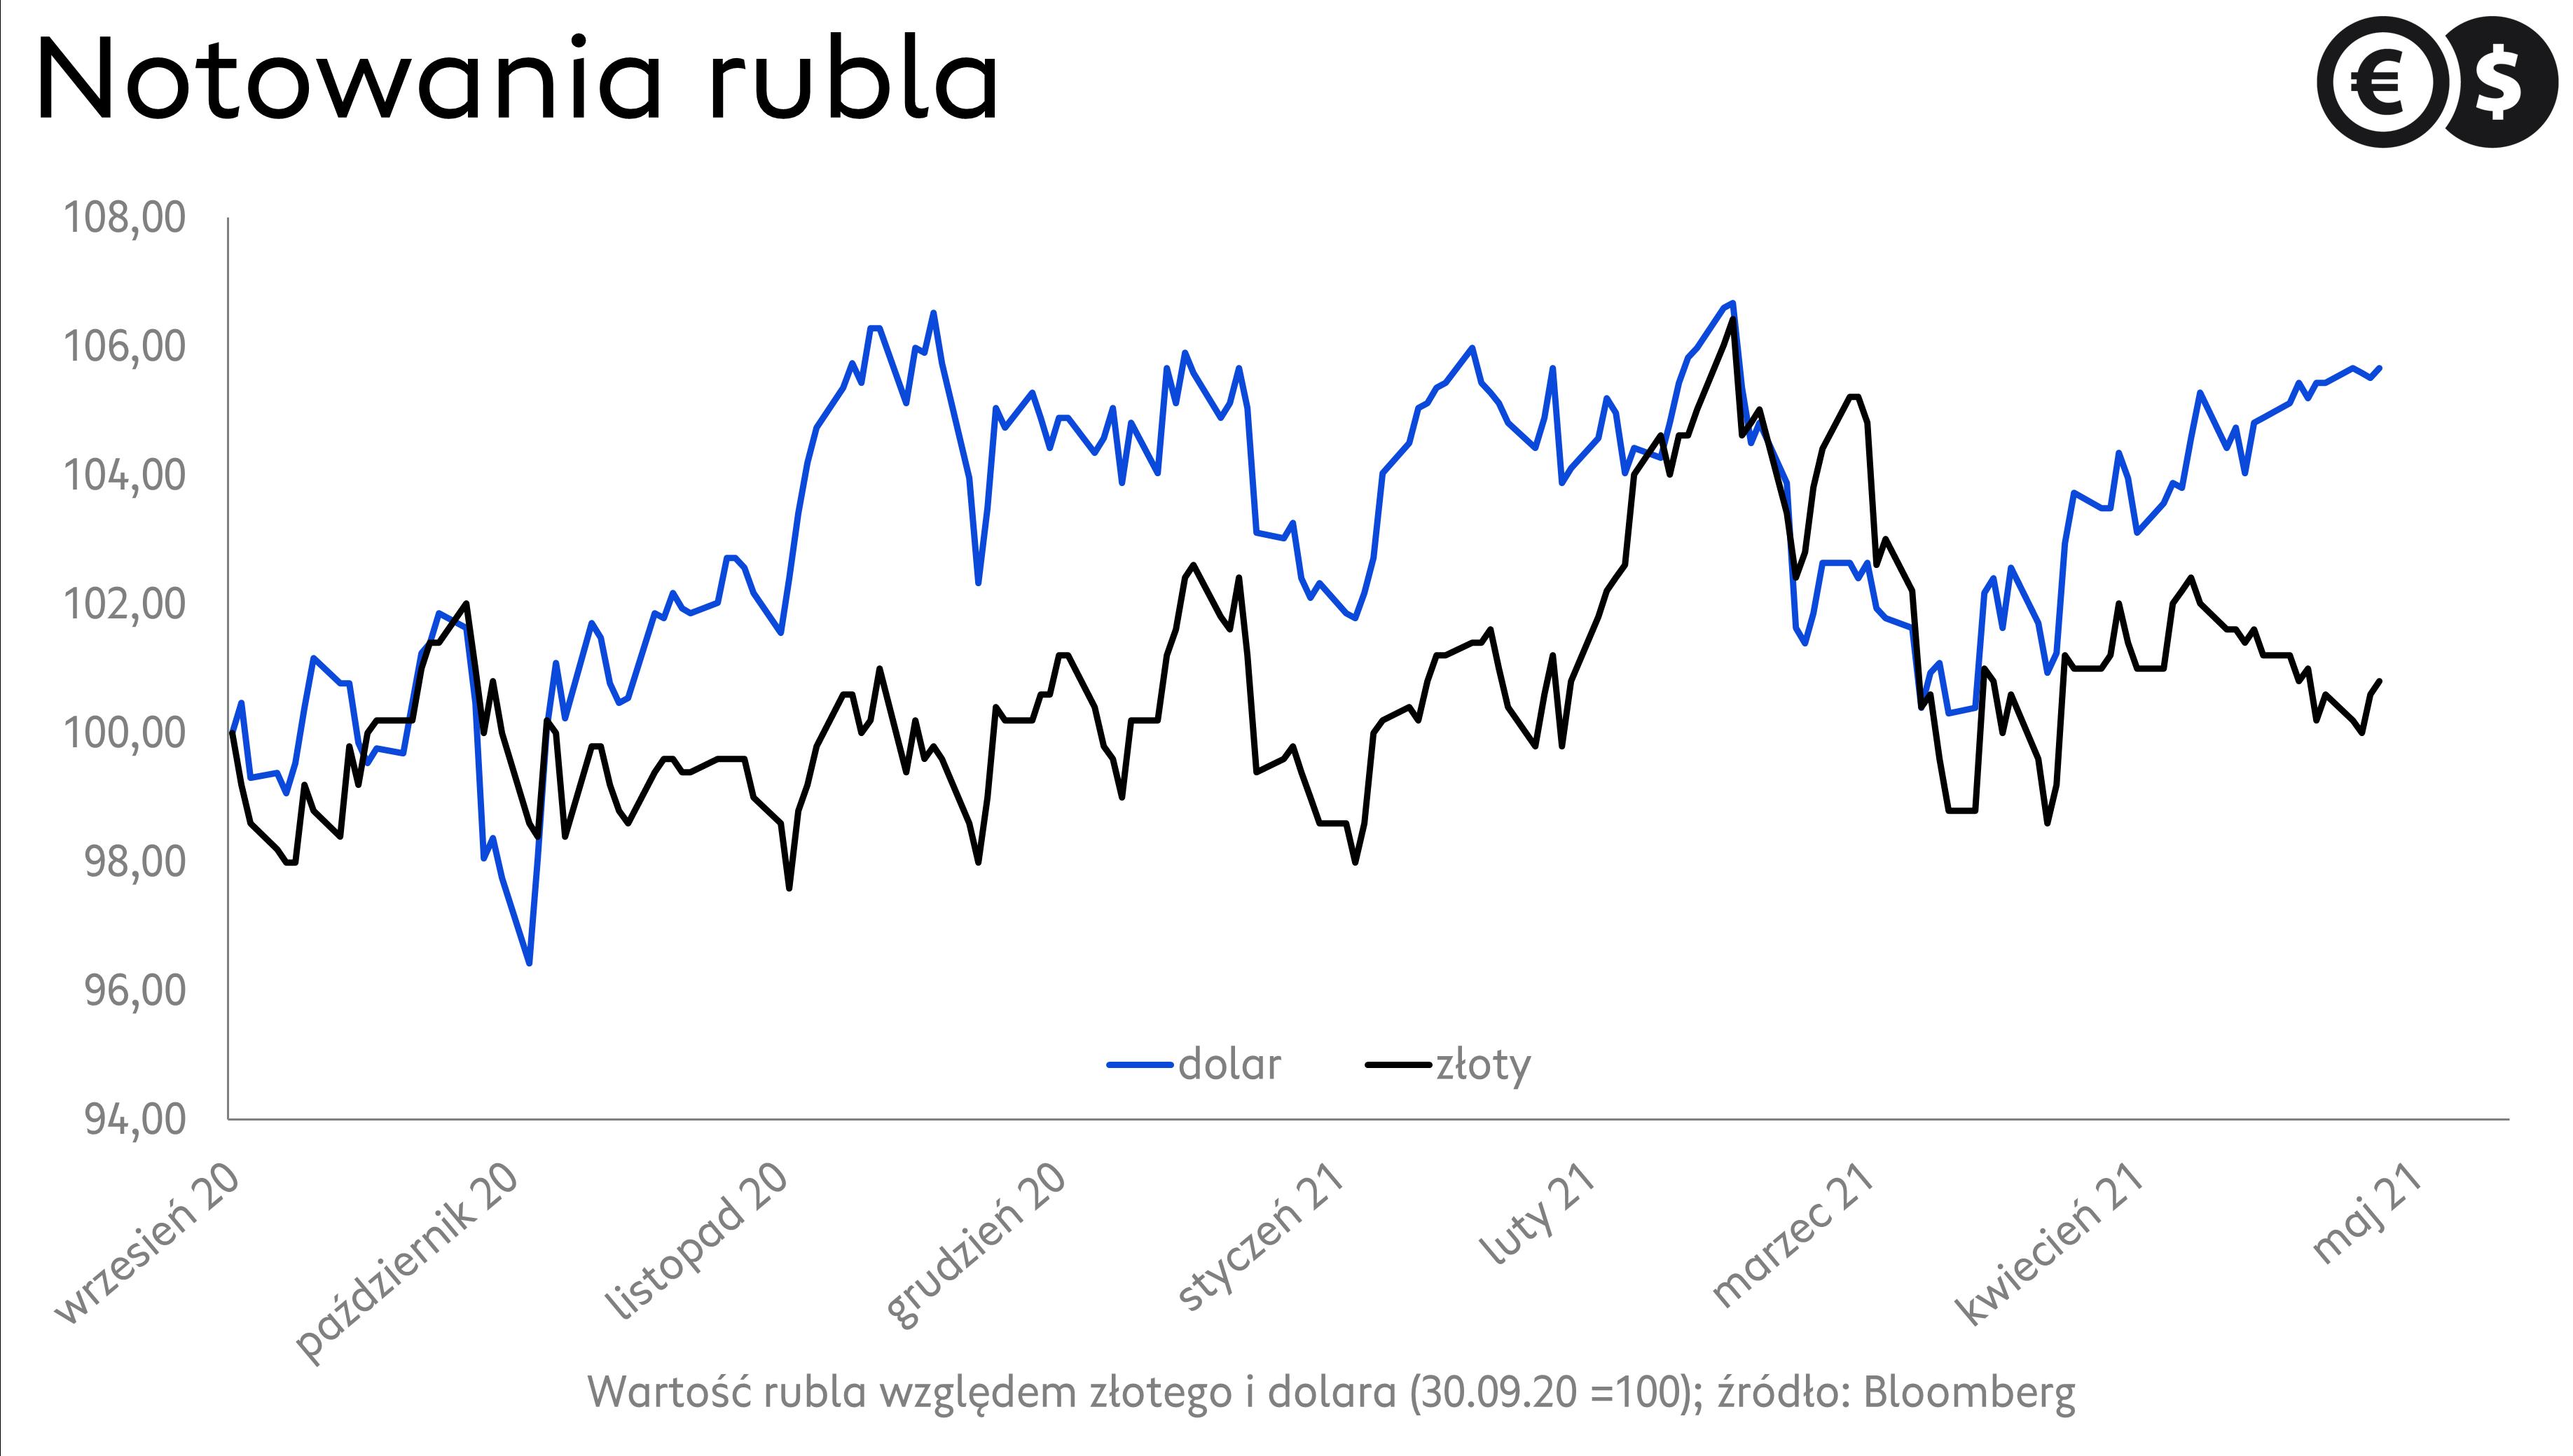 Kurs rubla. Notowania USD/RUB; źródło: Bloomberg.